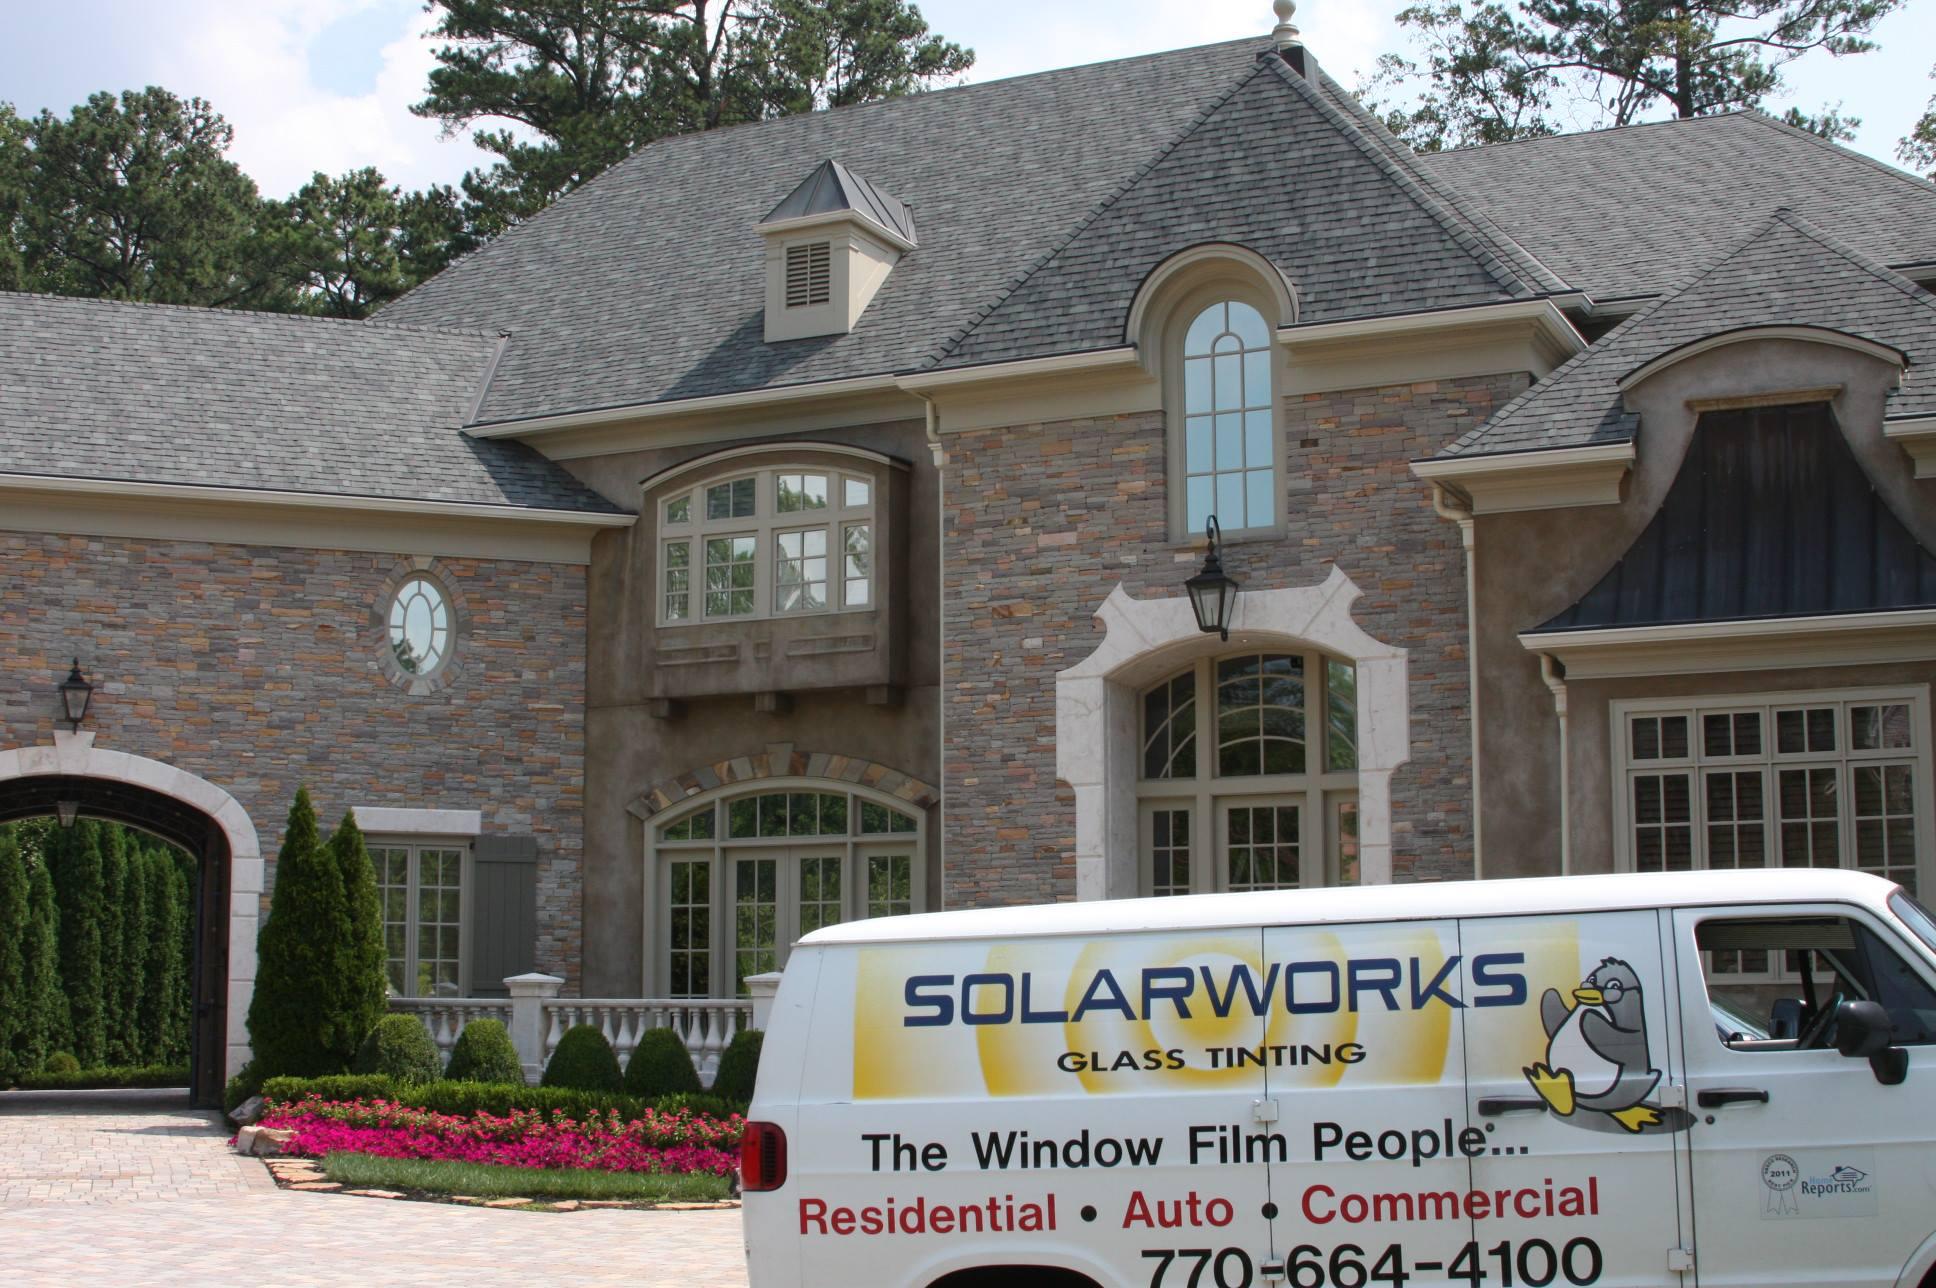 Solarworks Glass Tinting - Roswell, GA